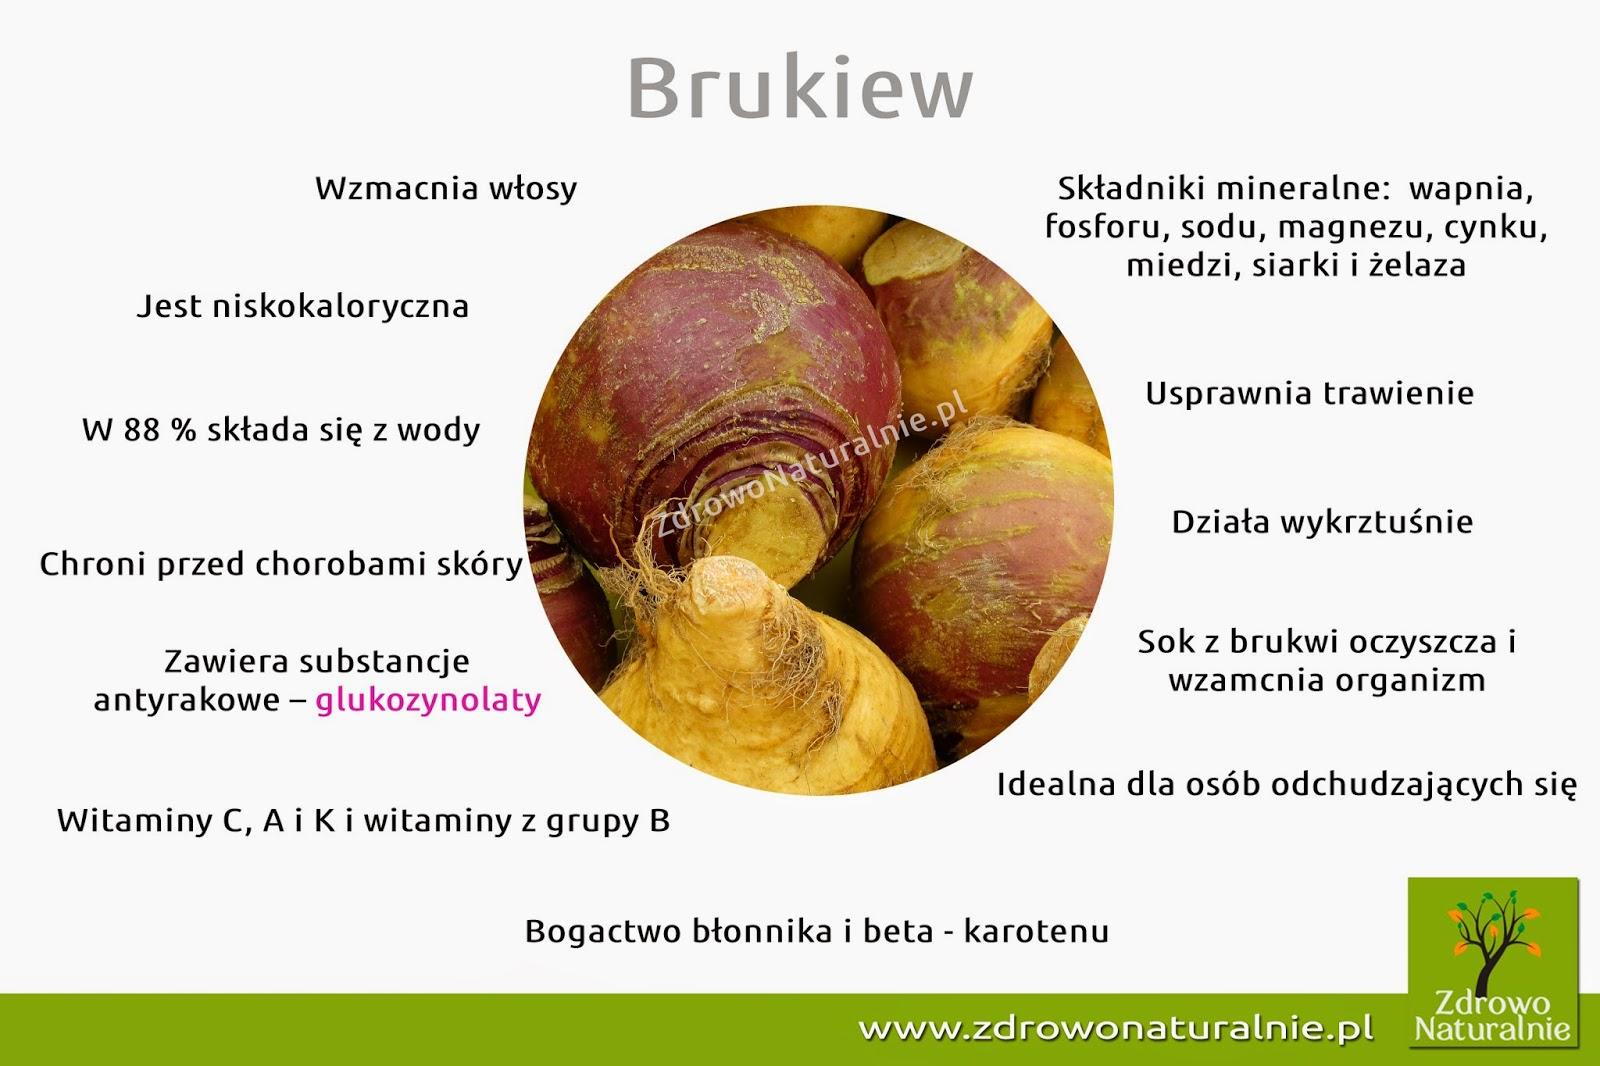 Brukiew